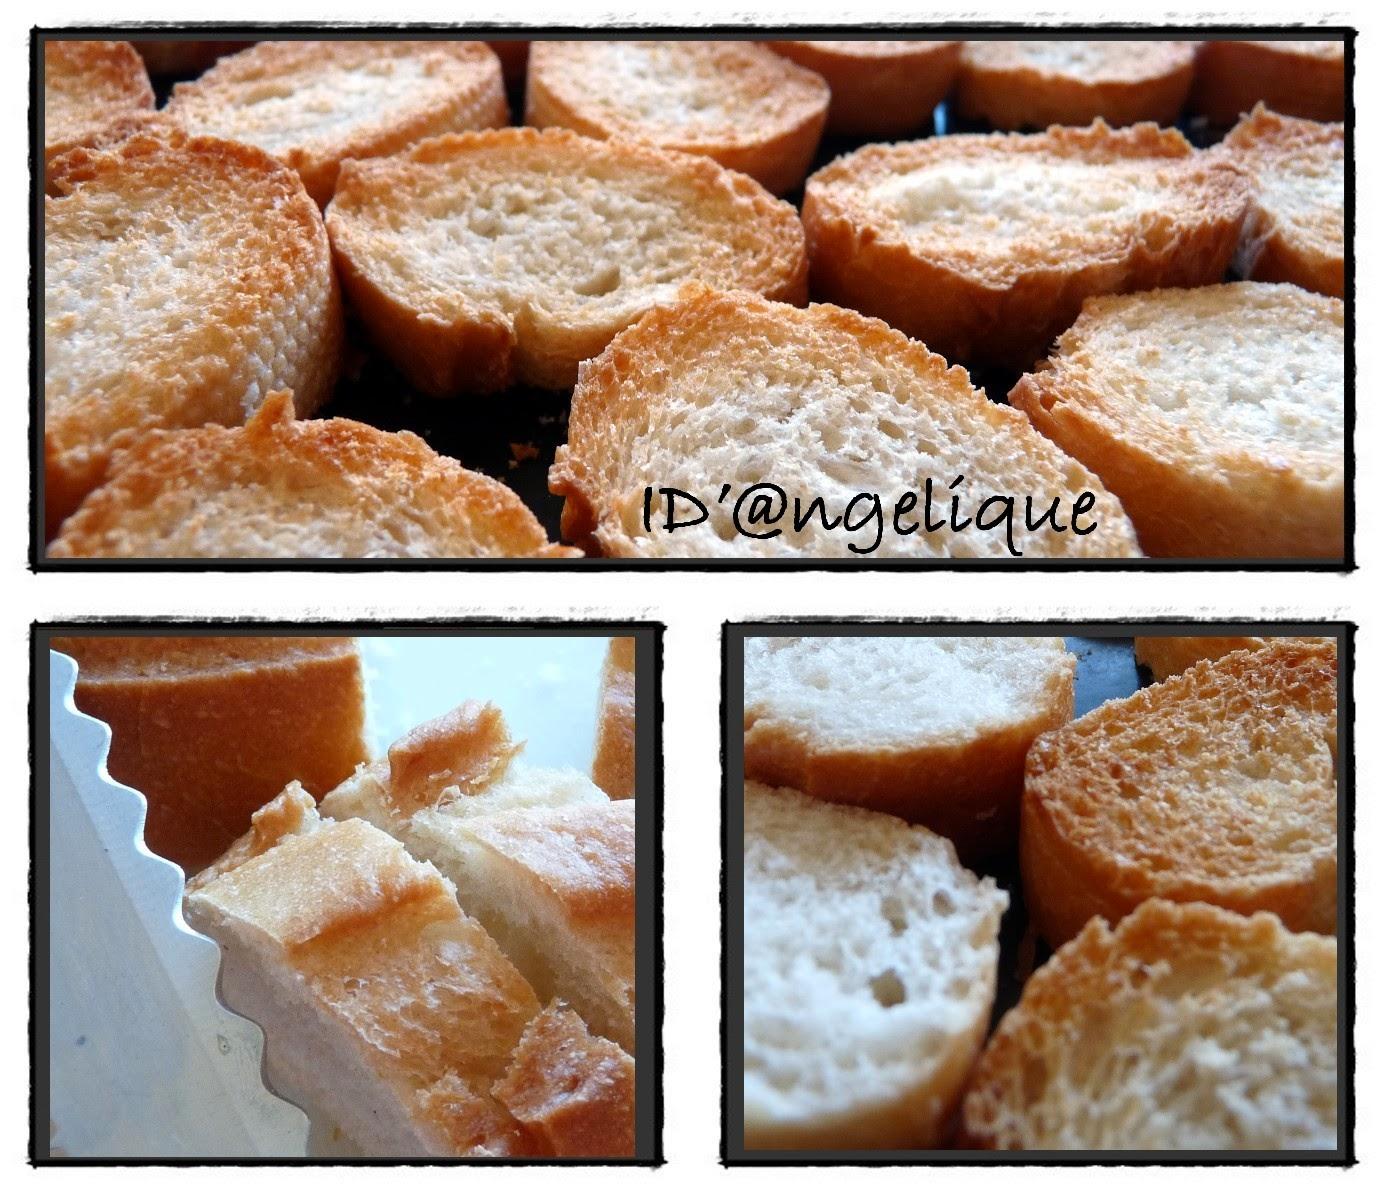 Les id 39 ng lique toasts de foie gras po l - Cuire du foie gras ...